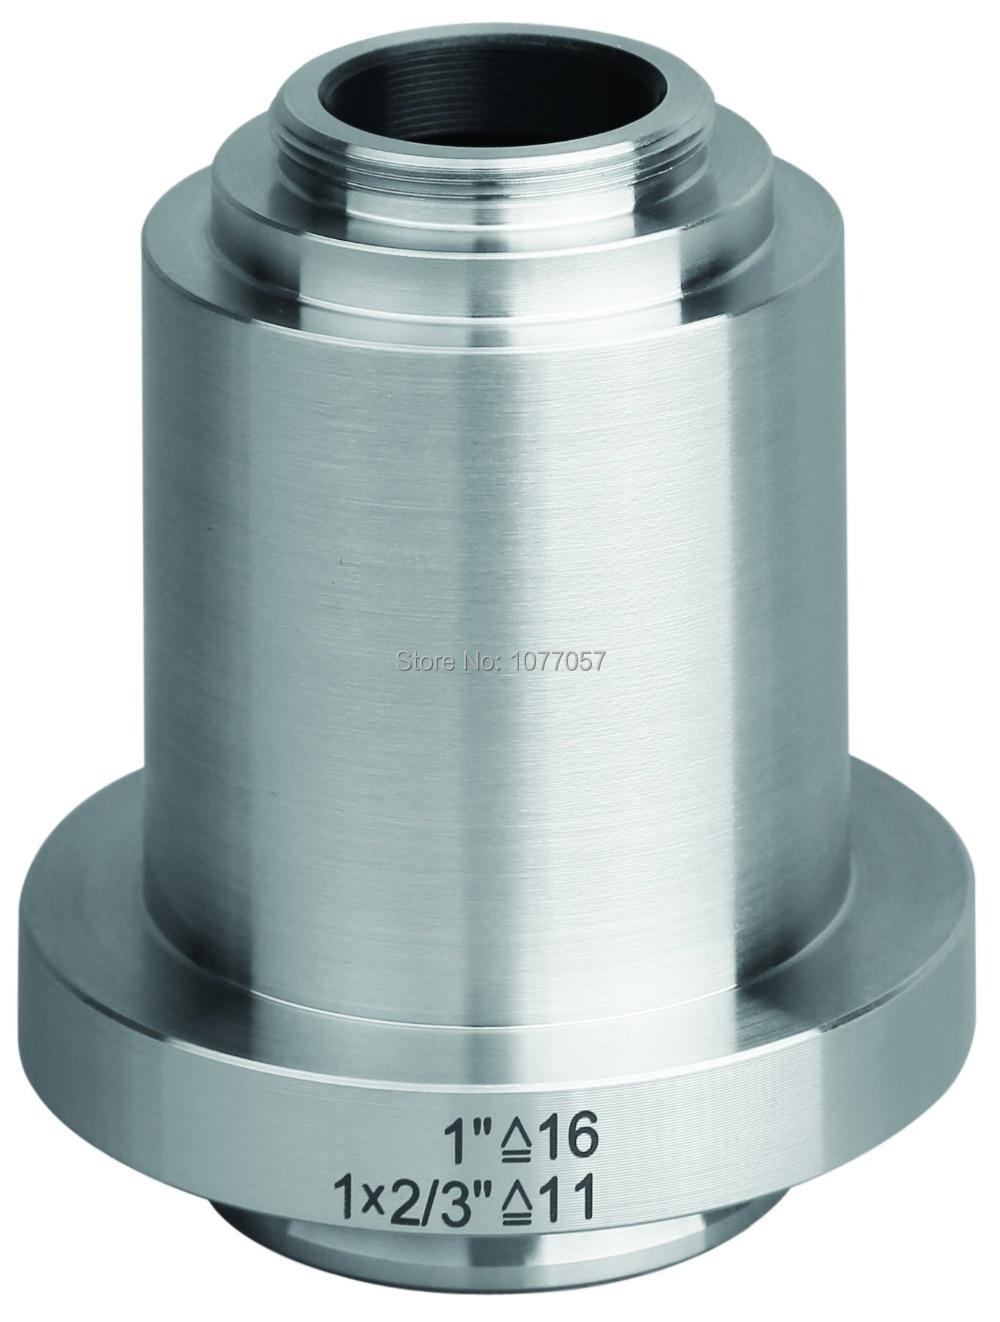 Scientific Microscope C-Mount adapter 1x fitting for Lei-ca Microscope Adapter,LEI-CA microscope C mount TV Adaptor lei cake